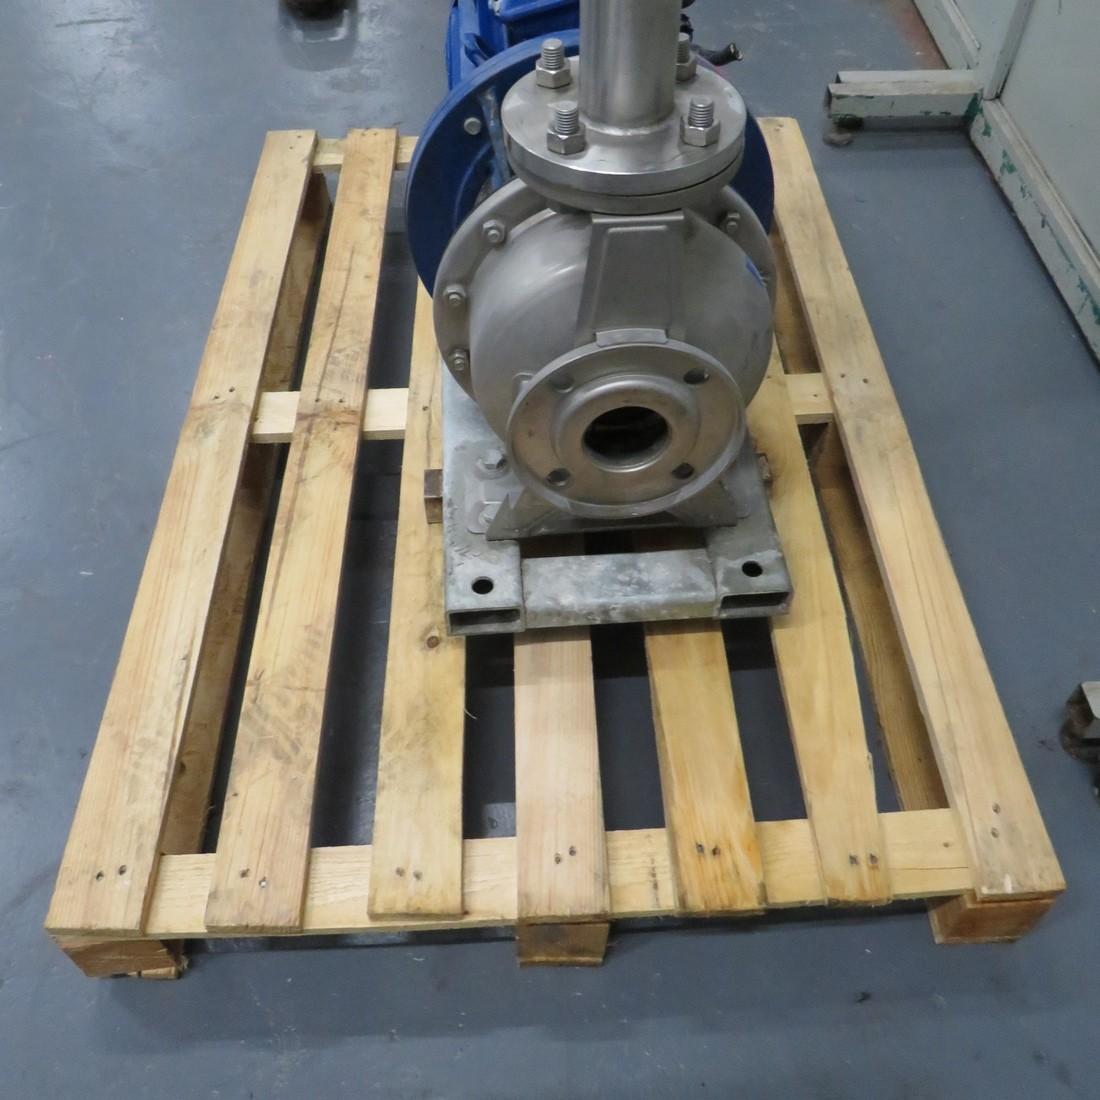 R10VA1282 Stainless steel HILGE centrifugal pump - Type DURACHROM 65-50-200 - Hp15